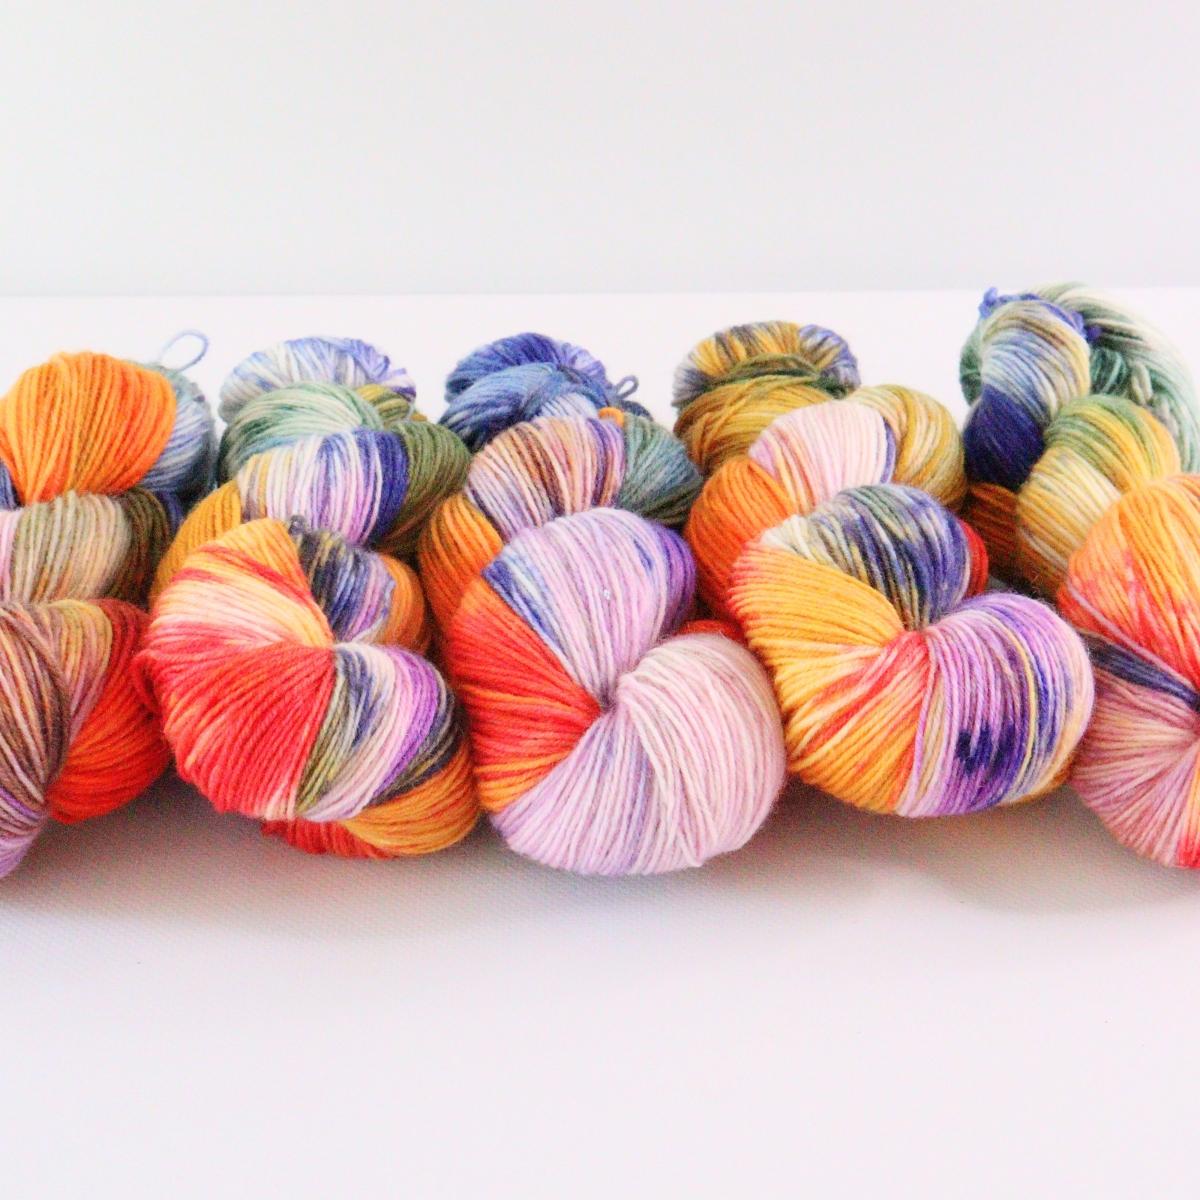 woodico.pro hand dyed yarn 078 4 1200x1200 - Hand dyed yarn / 078